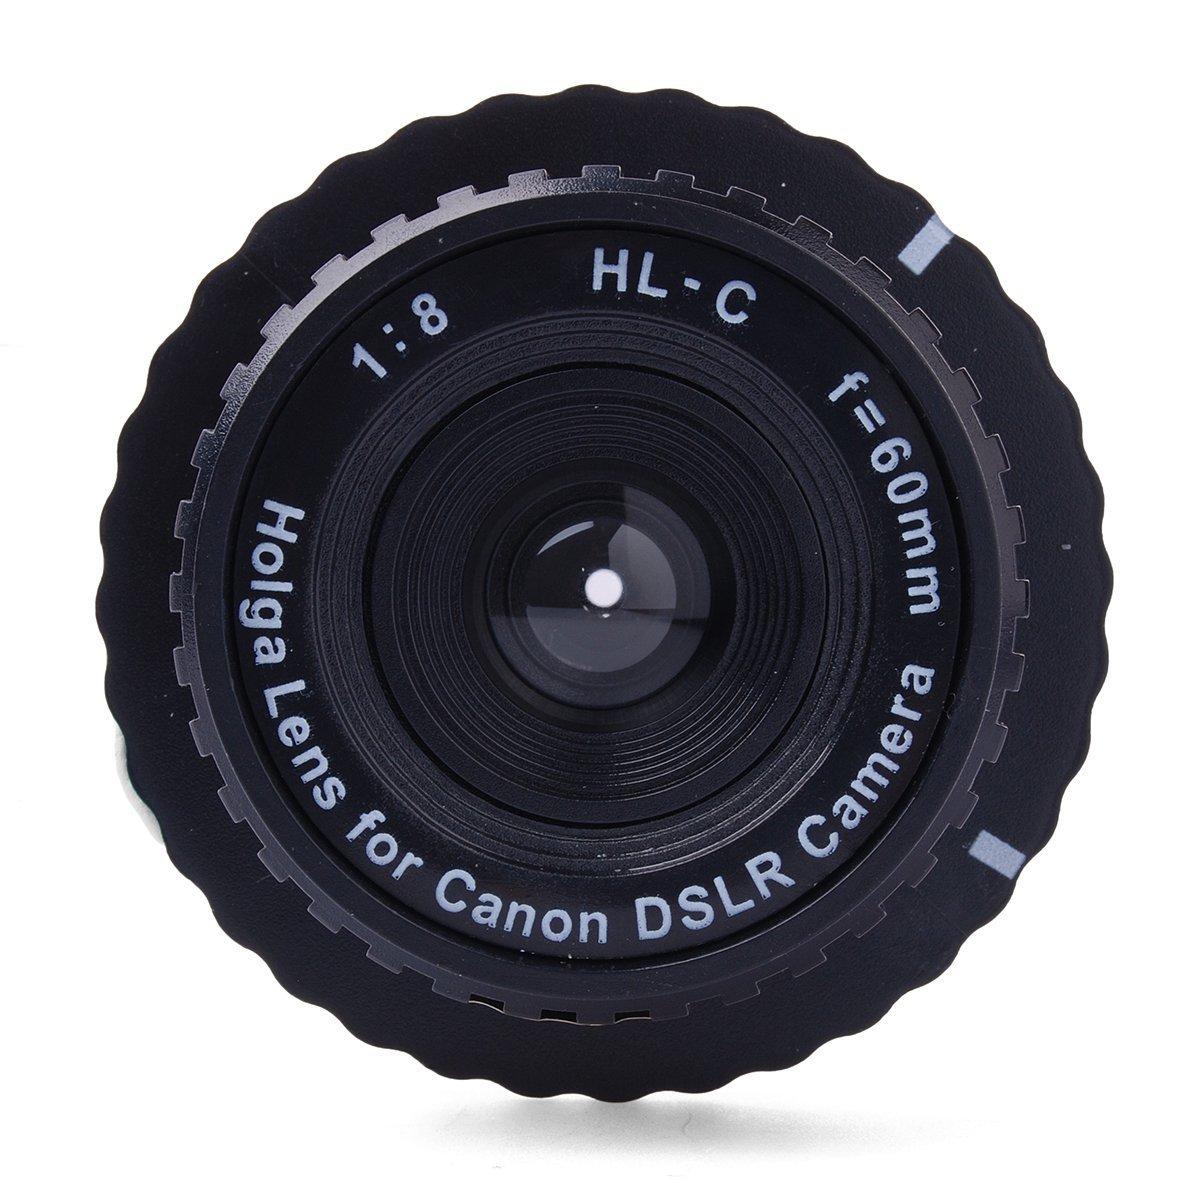 HOLGA(ホルガ) HL-C レンズ 60mm f/8  キヤノンデジタル一眼レフ用 DC519   B00QKBT8CE